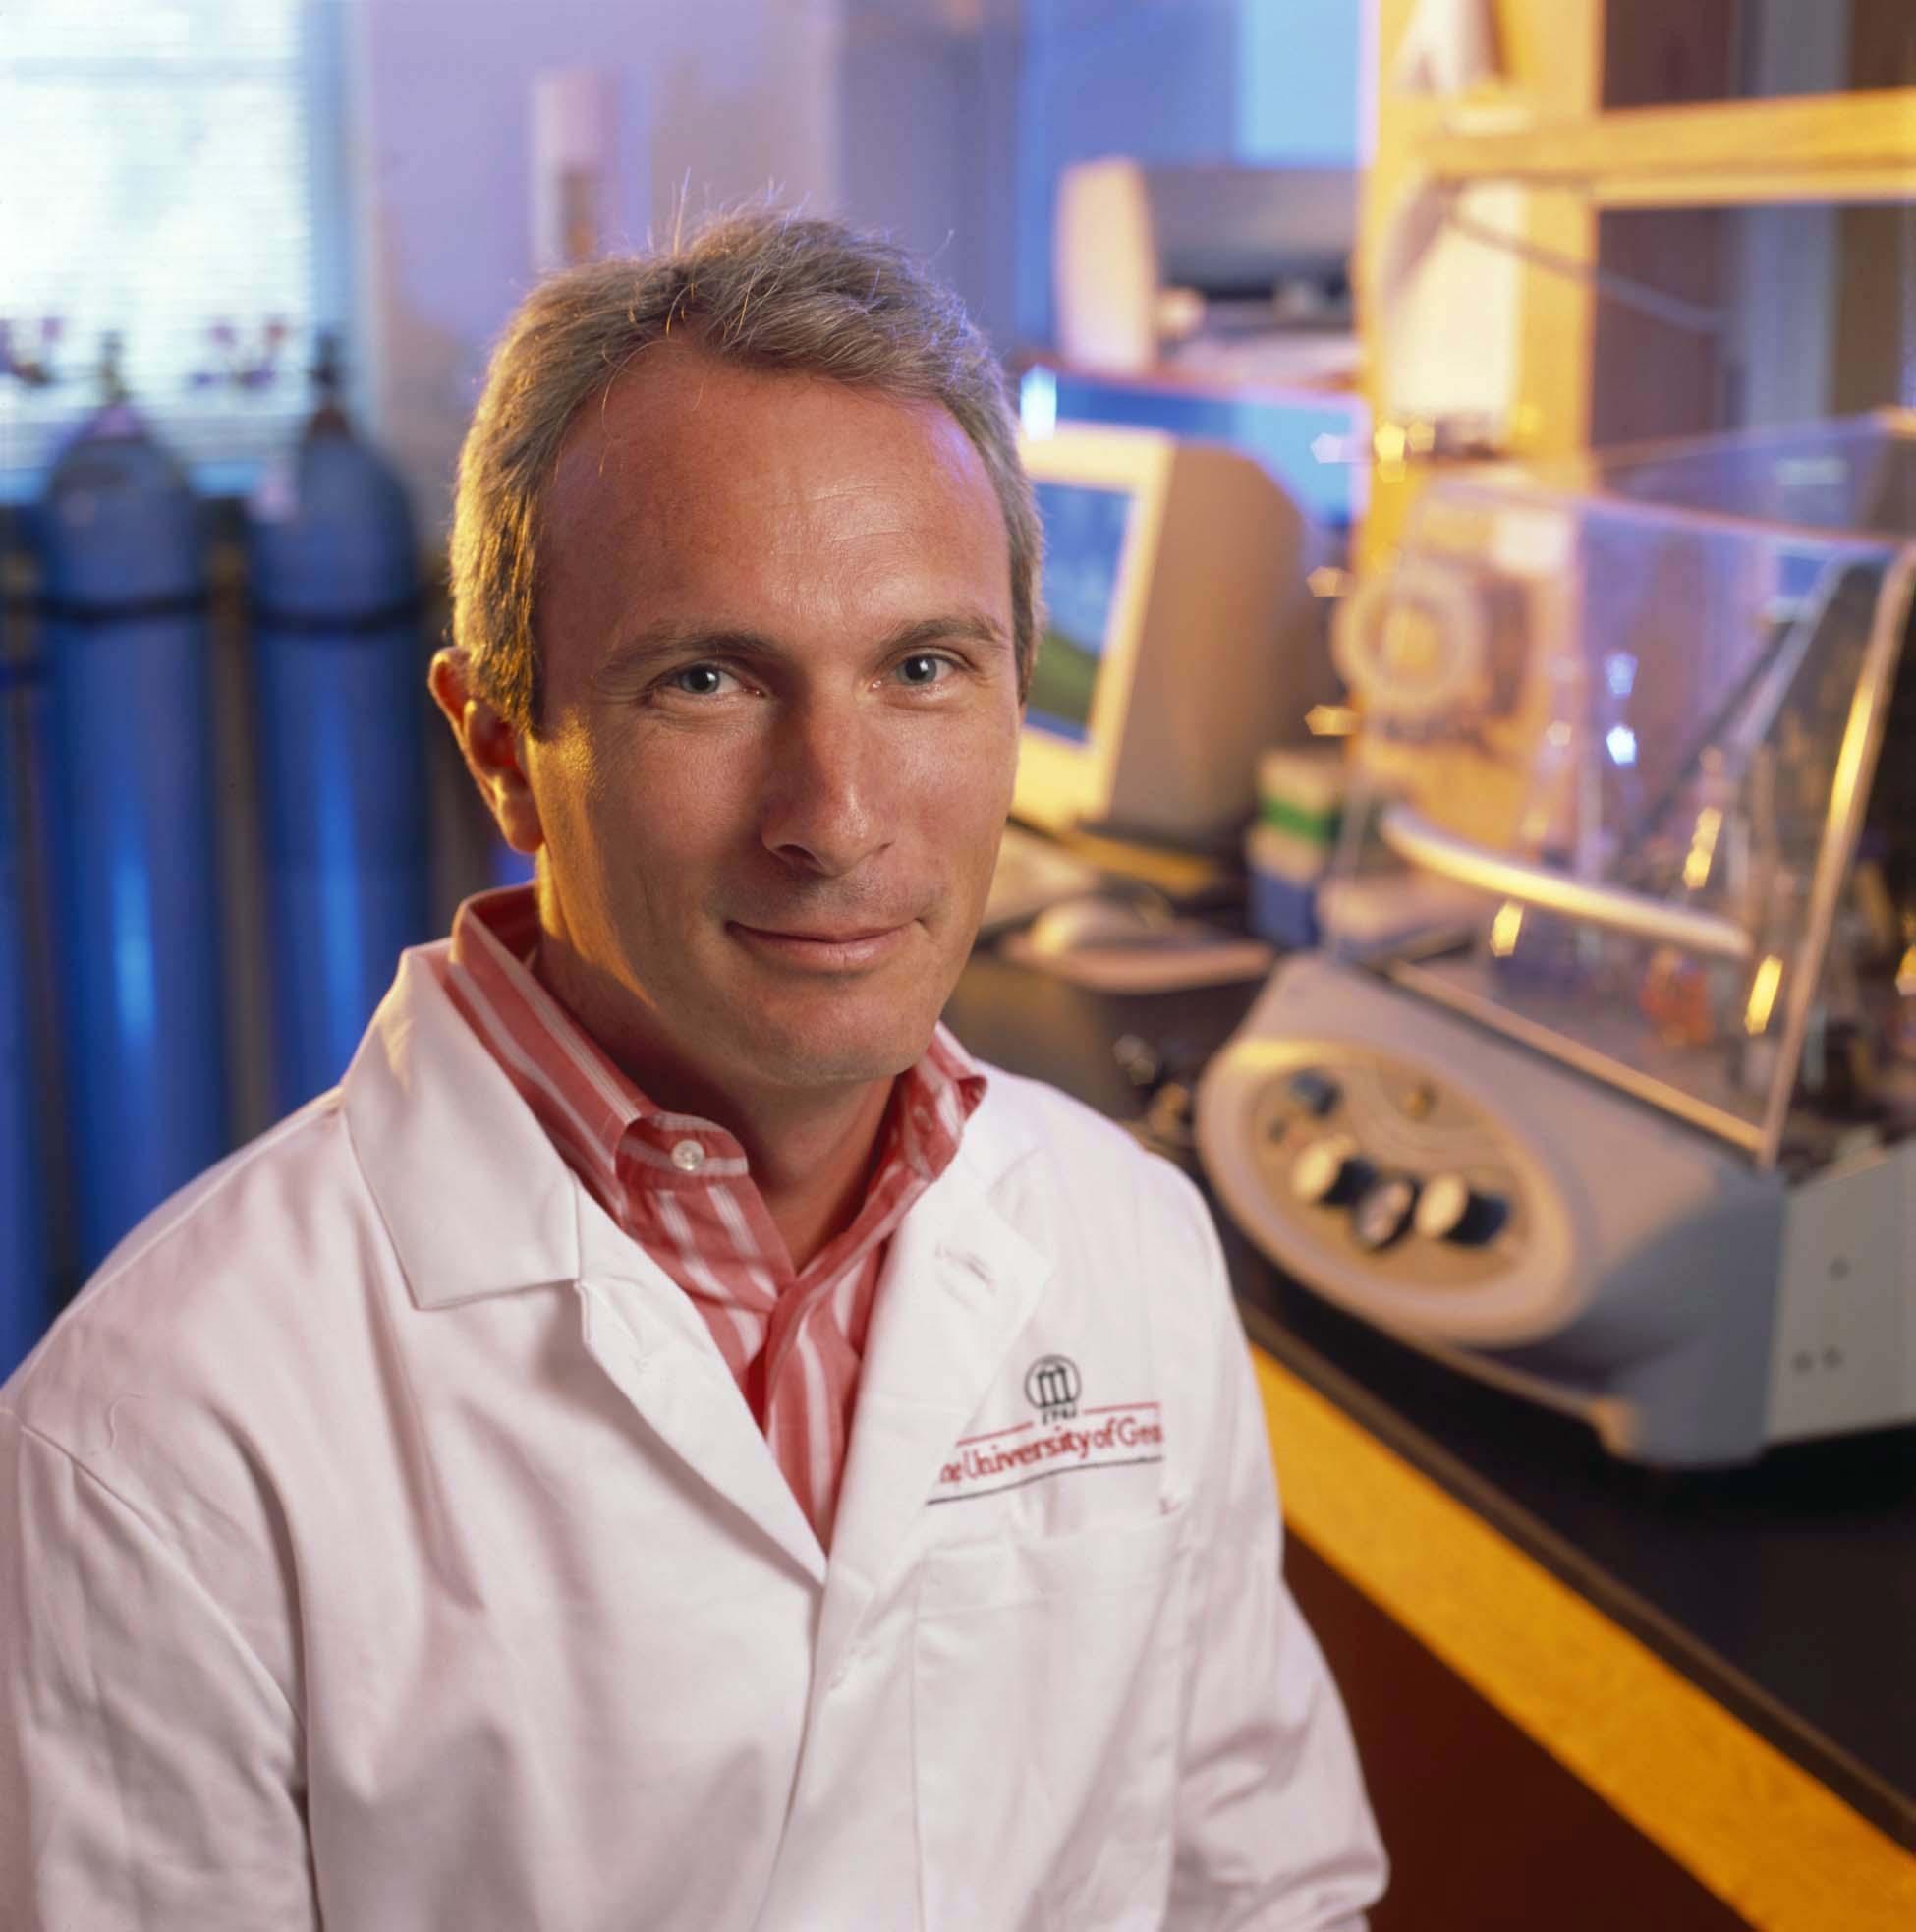 Dr. Scott Jackson